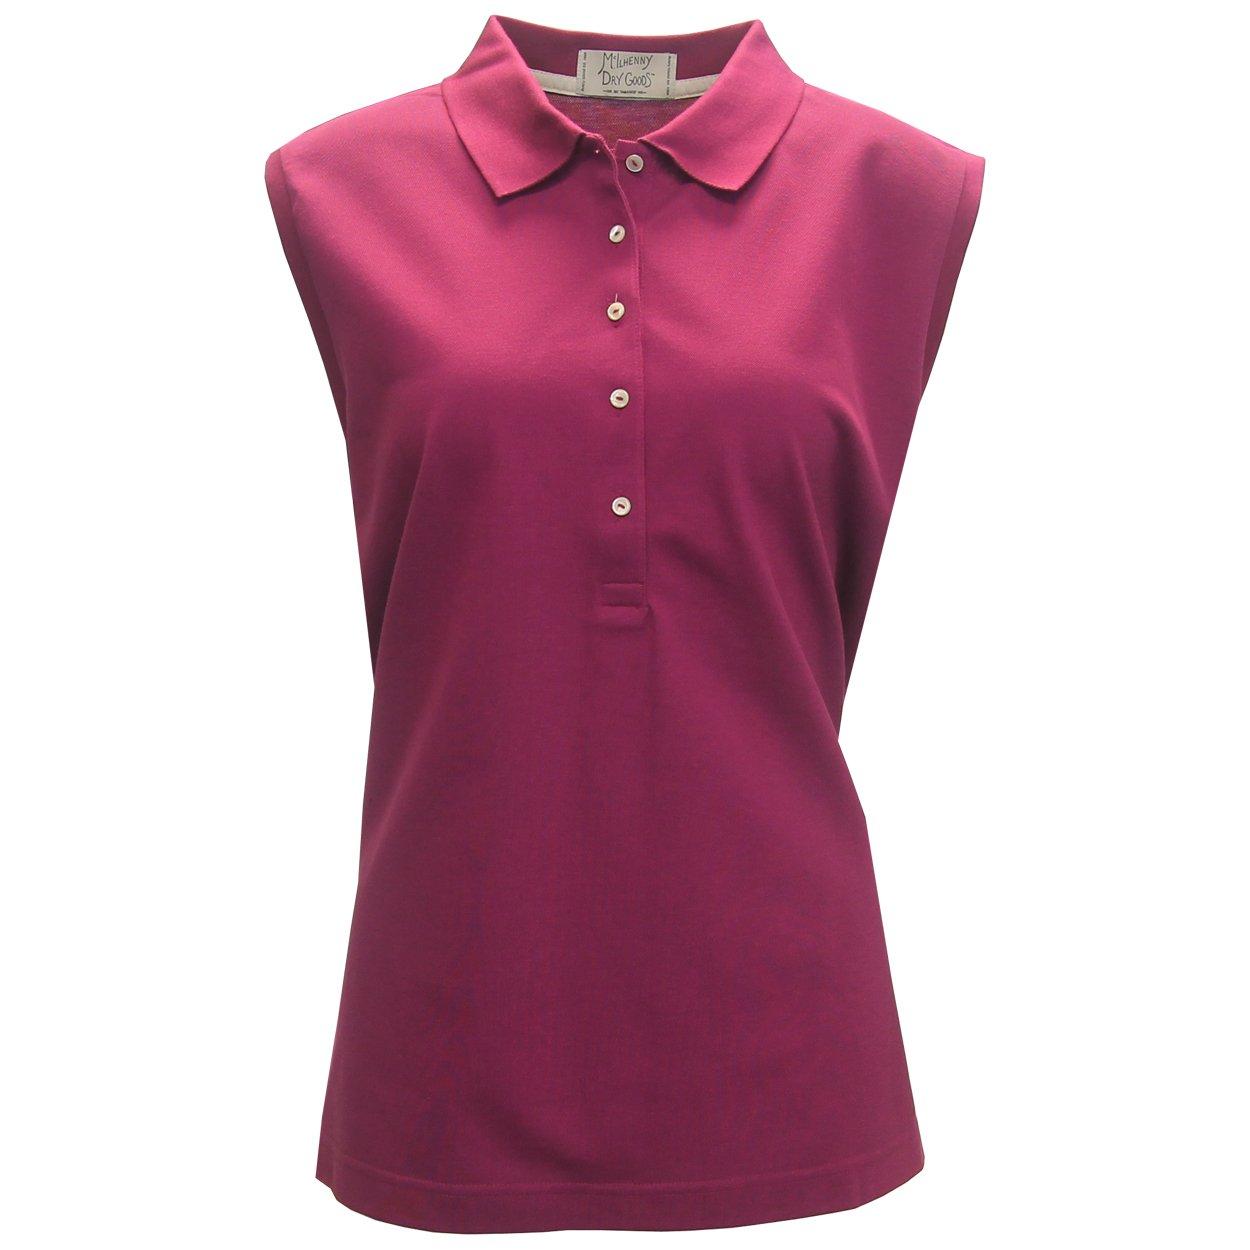 McIlhenny Women's Sleeveless Solid Pique Polo Golf Shirt, X-Large Raspberry